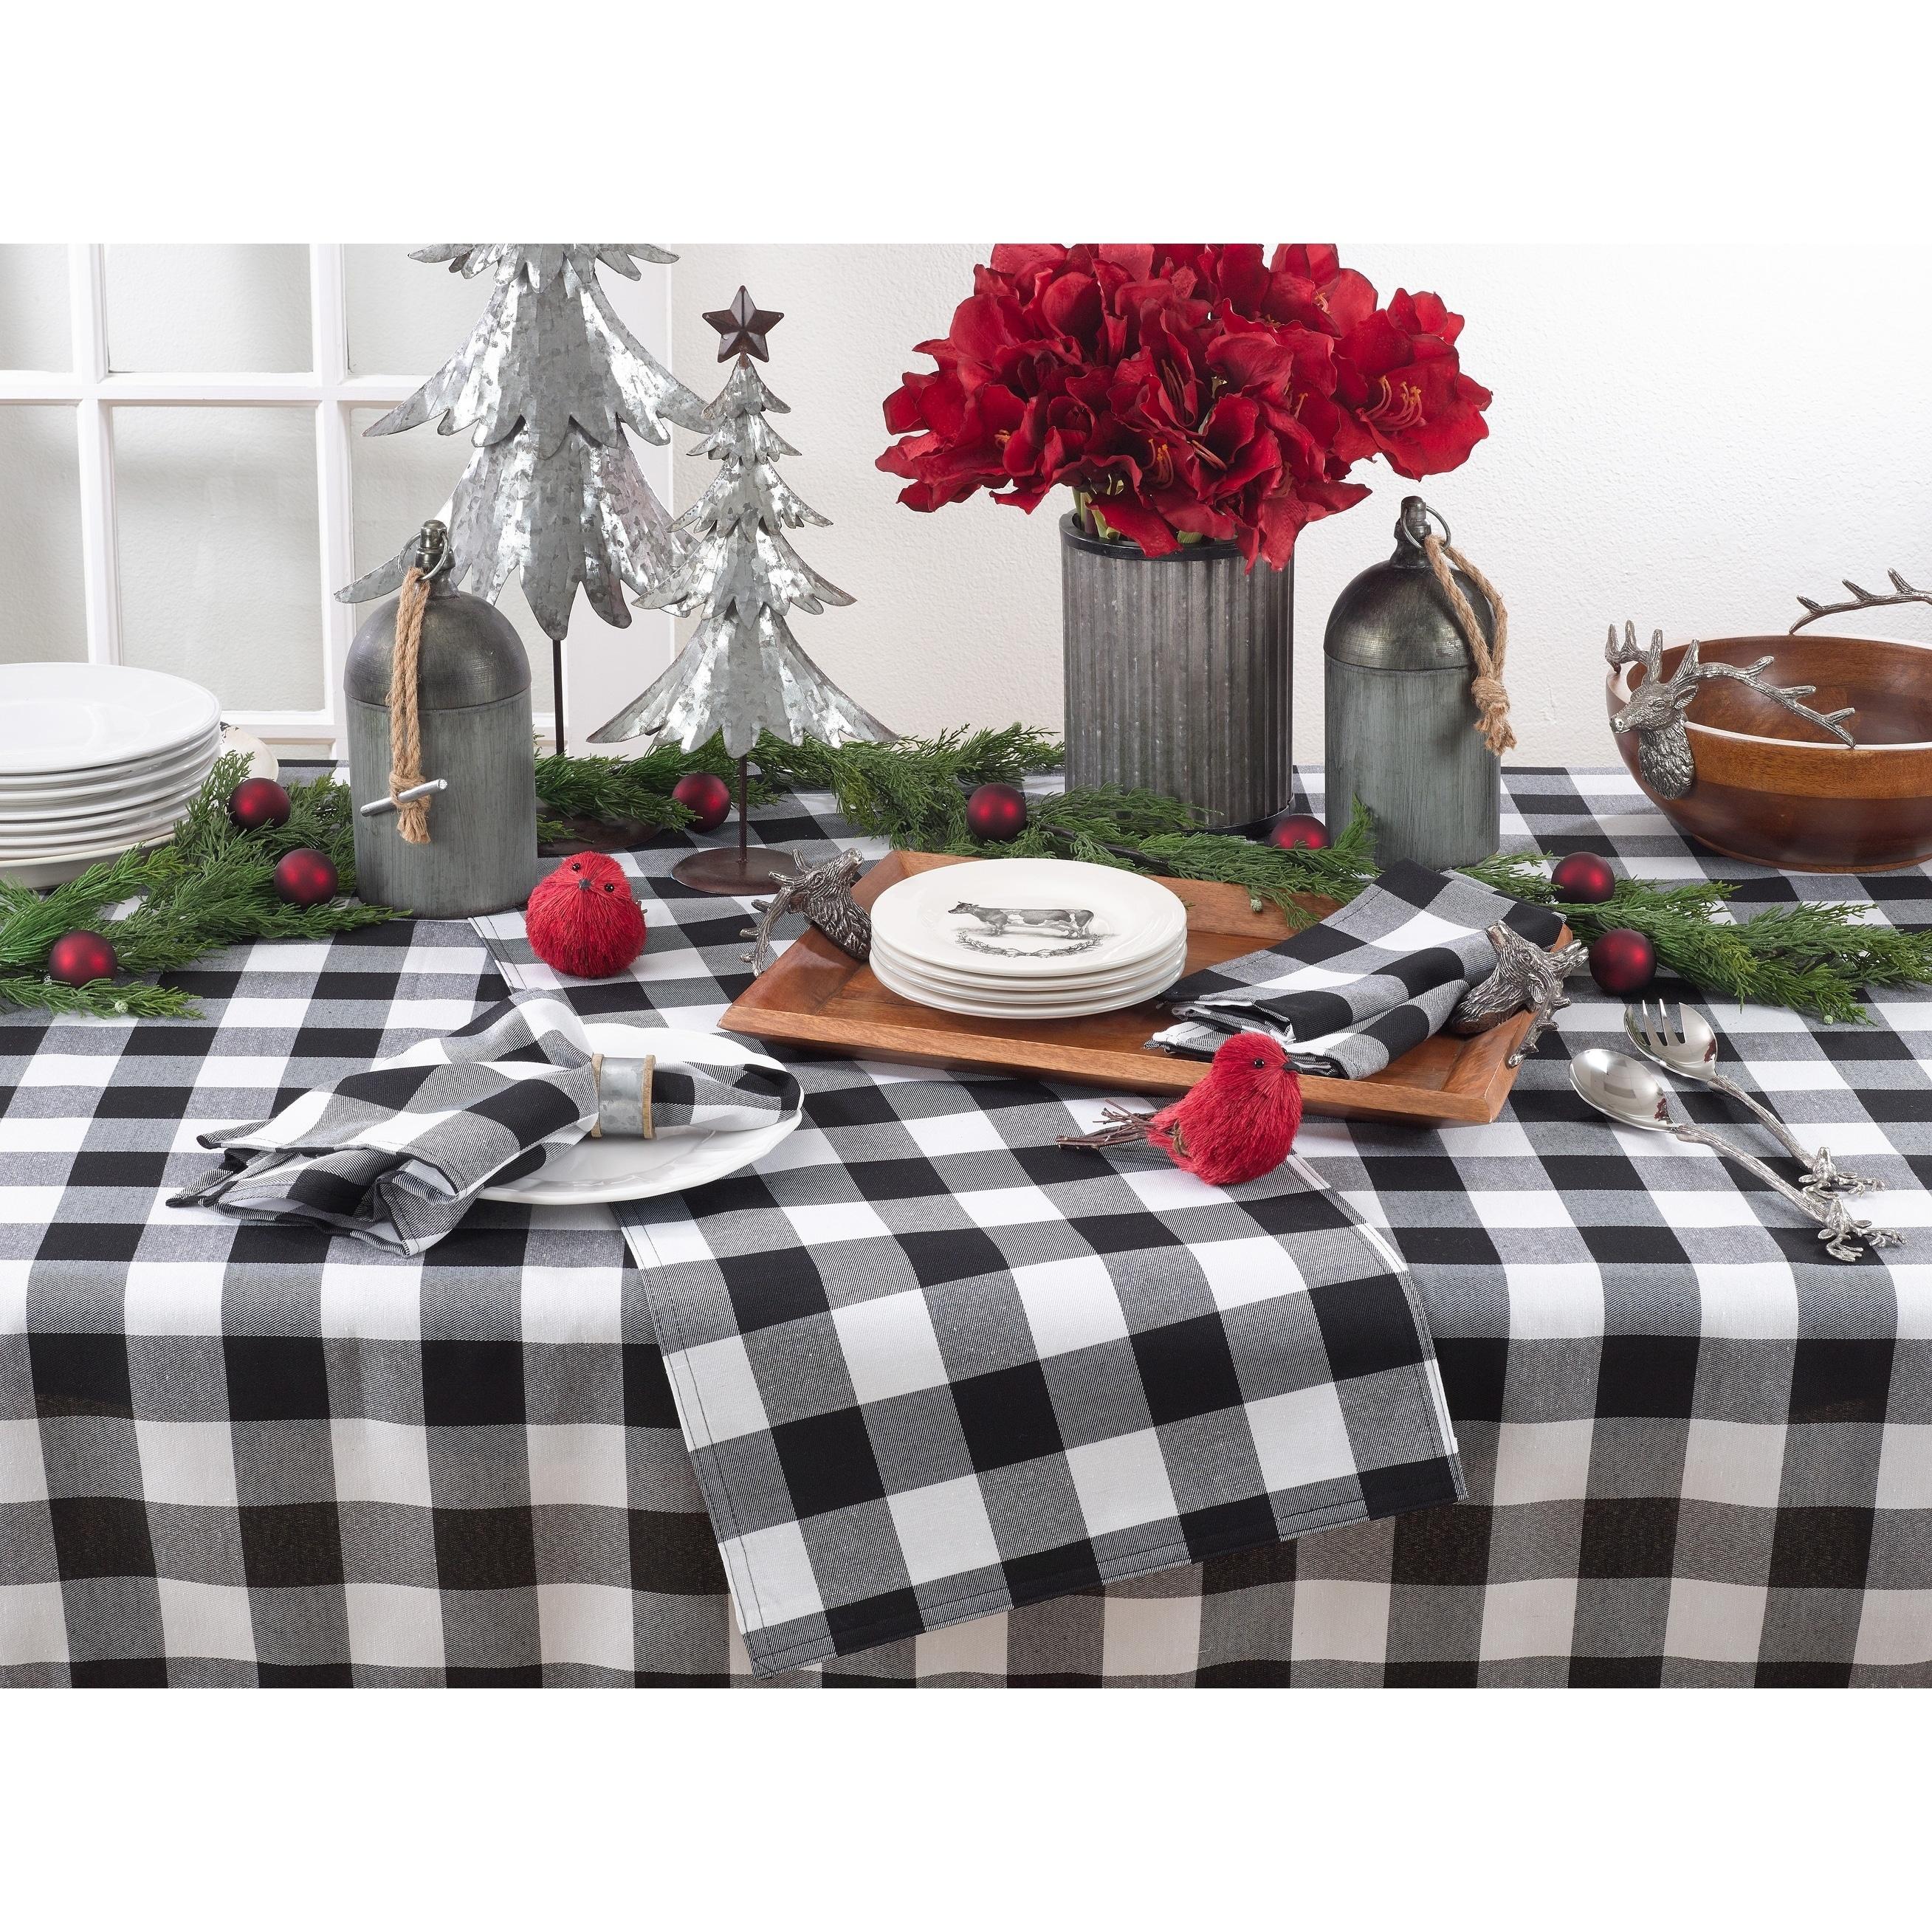 Cool Buffalo Plaid Design Cotton Blend Tablecloth Ibusinesslaw Wood Chair Design Ideas Ibusinesslaworg